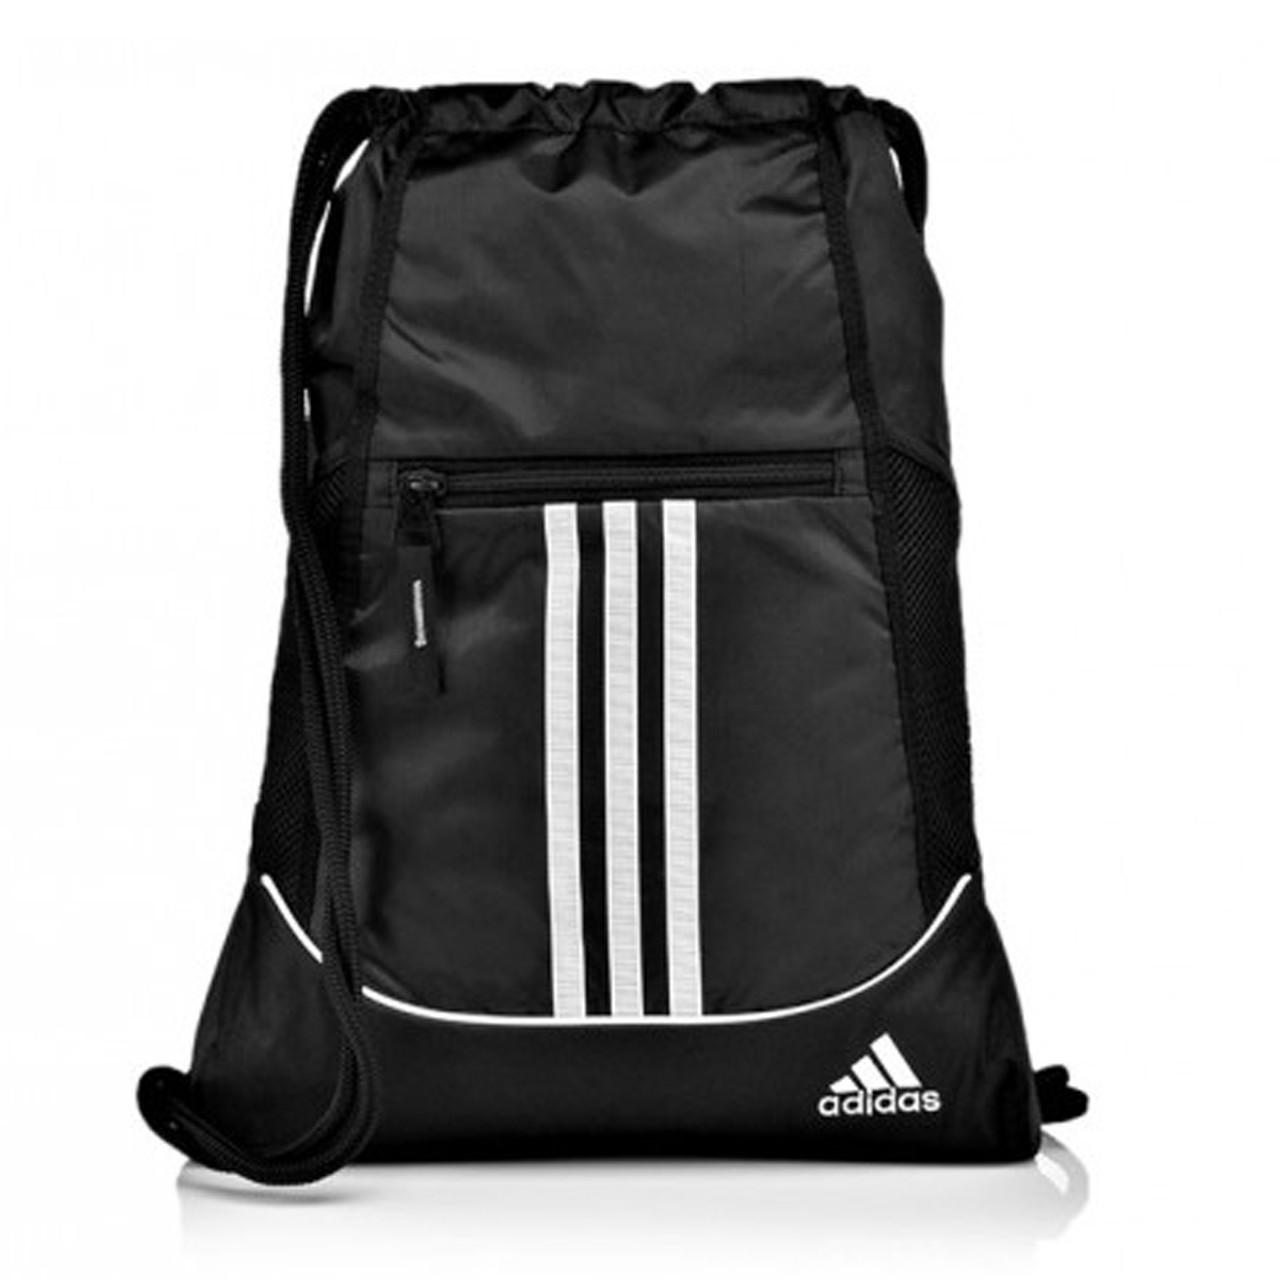 Adidas Alliance II Sackpack Travel Bag Various Colors